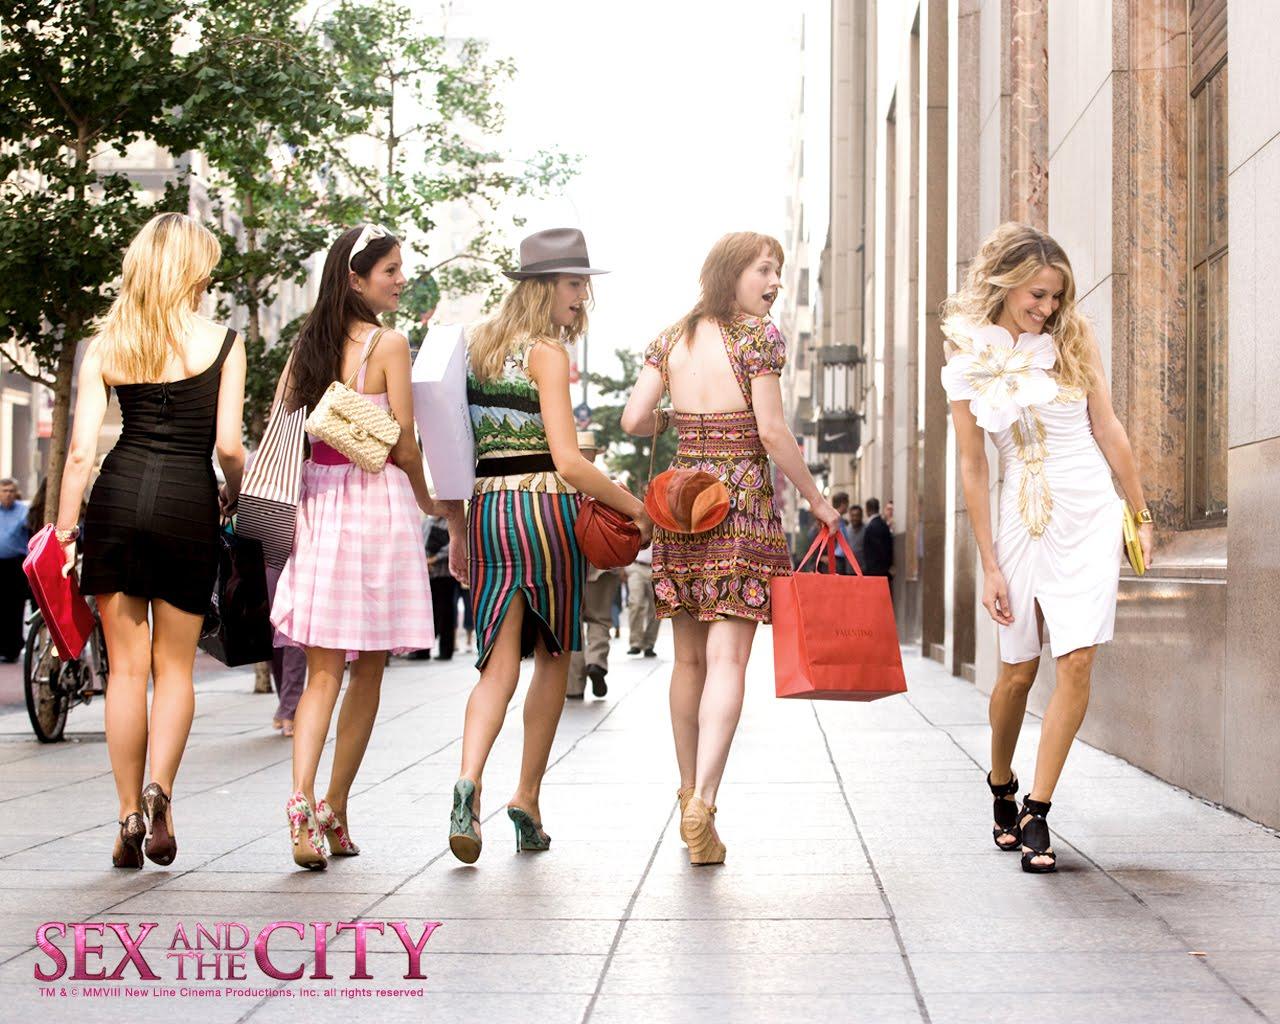 http://3.bp.blogspot.com/_nACuh6fxgB8/TDHtz_1kdMI/AAAAAAAAAFo/MDbs_TgleKs/s1600/Sarah_Jessica_Parker_in_Sex_and_the_City__The_Movie_Wallpaper_11_1024.jpg